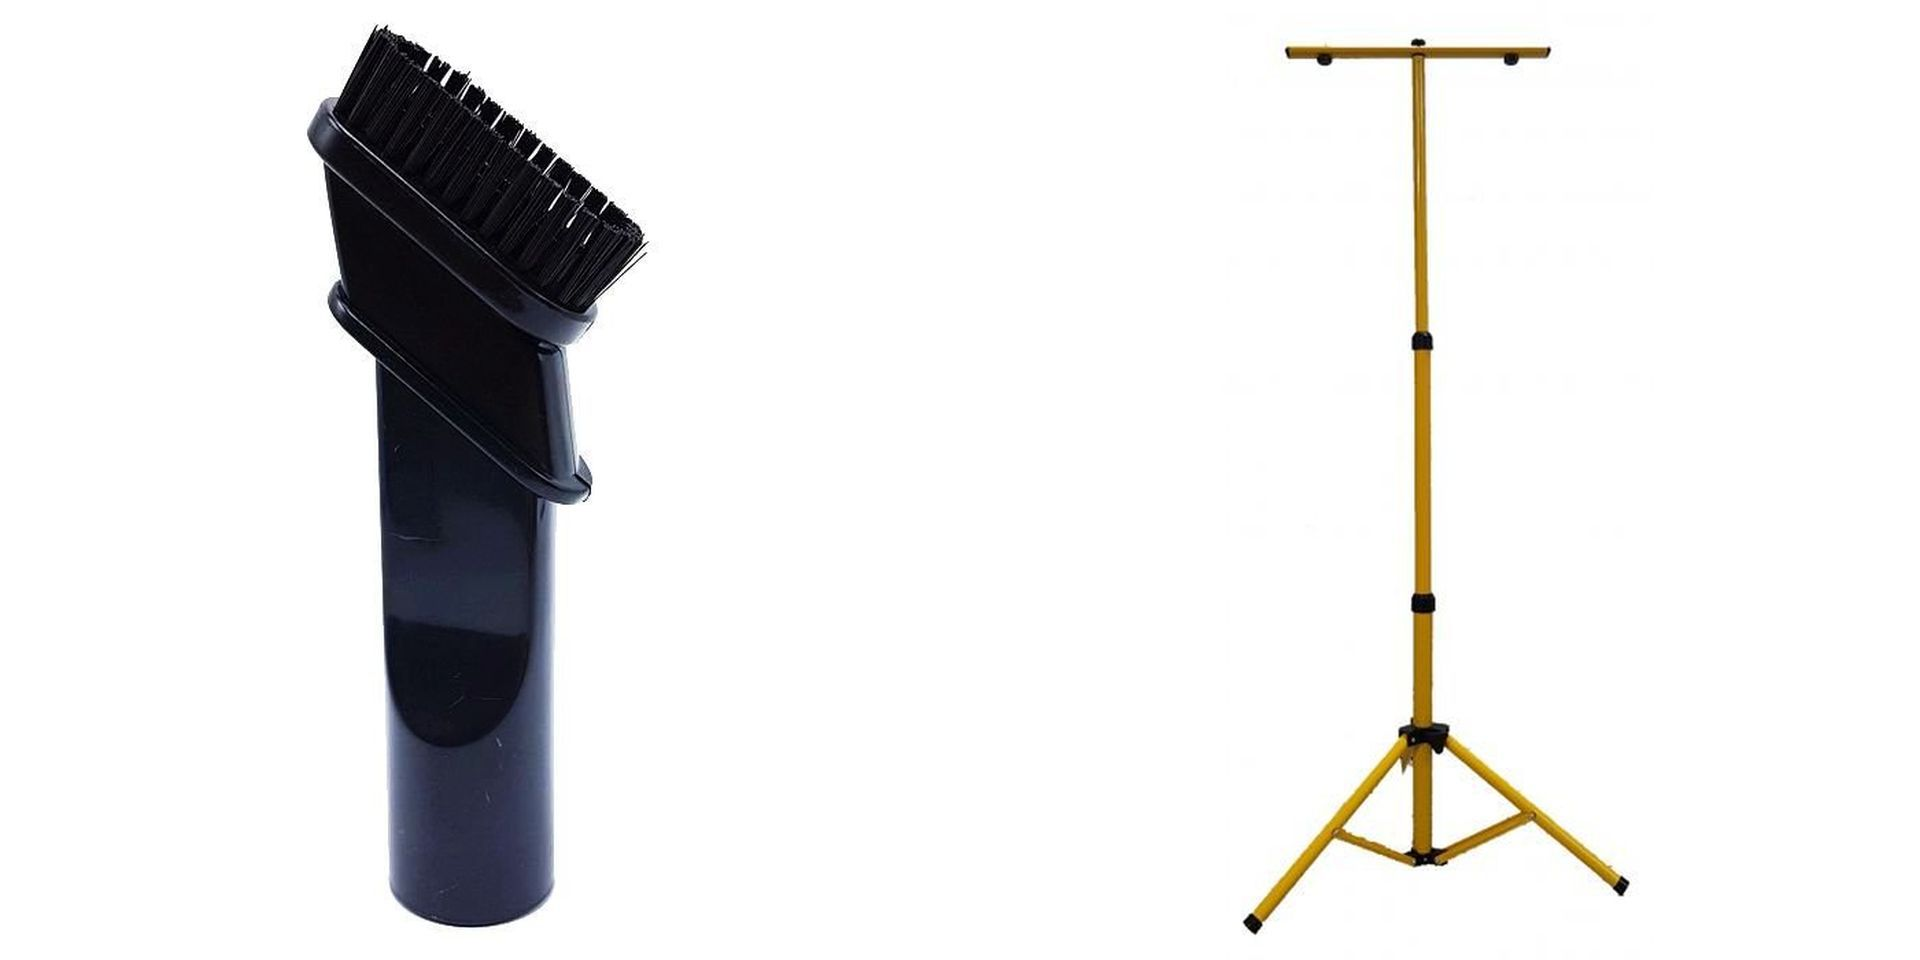 Kit Tripe para Refletor 1,60 x70cm +Bico de Canto Ecoclean